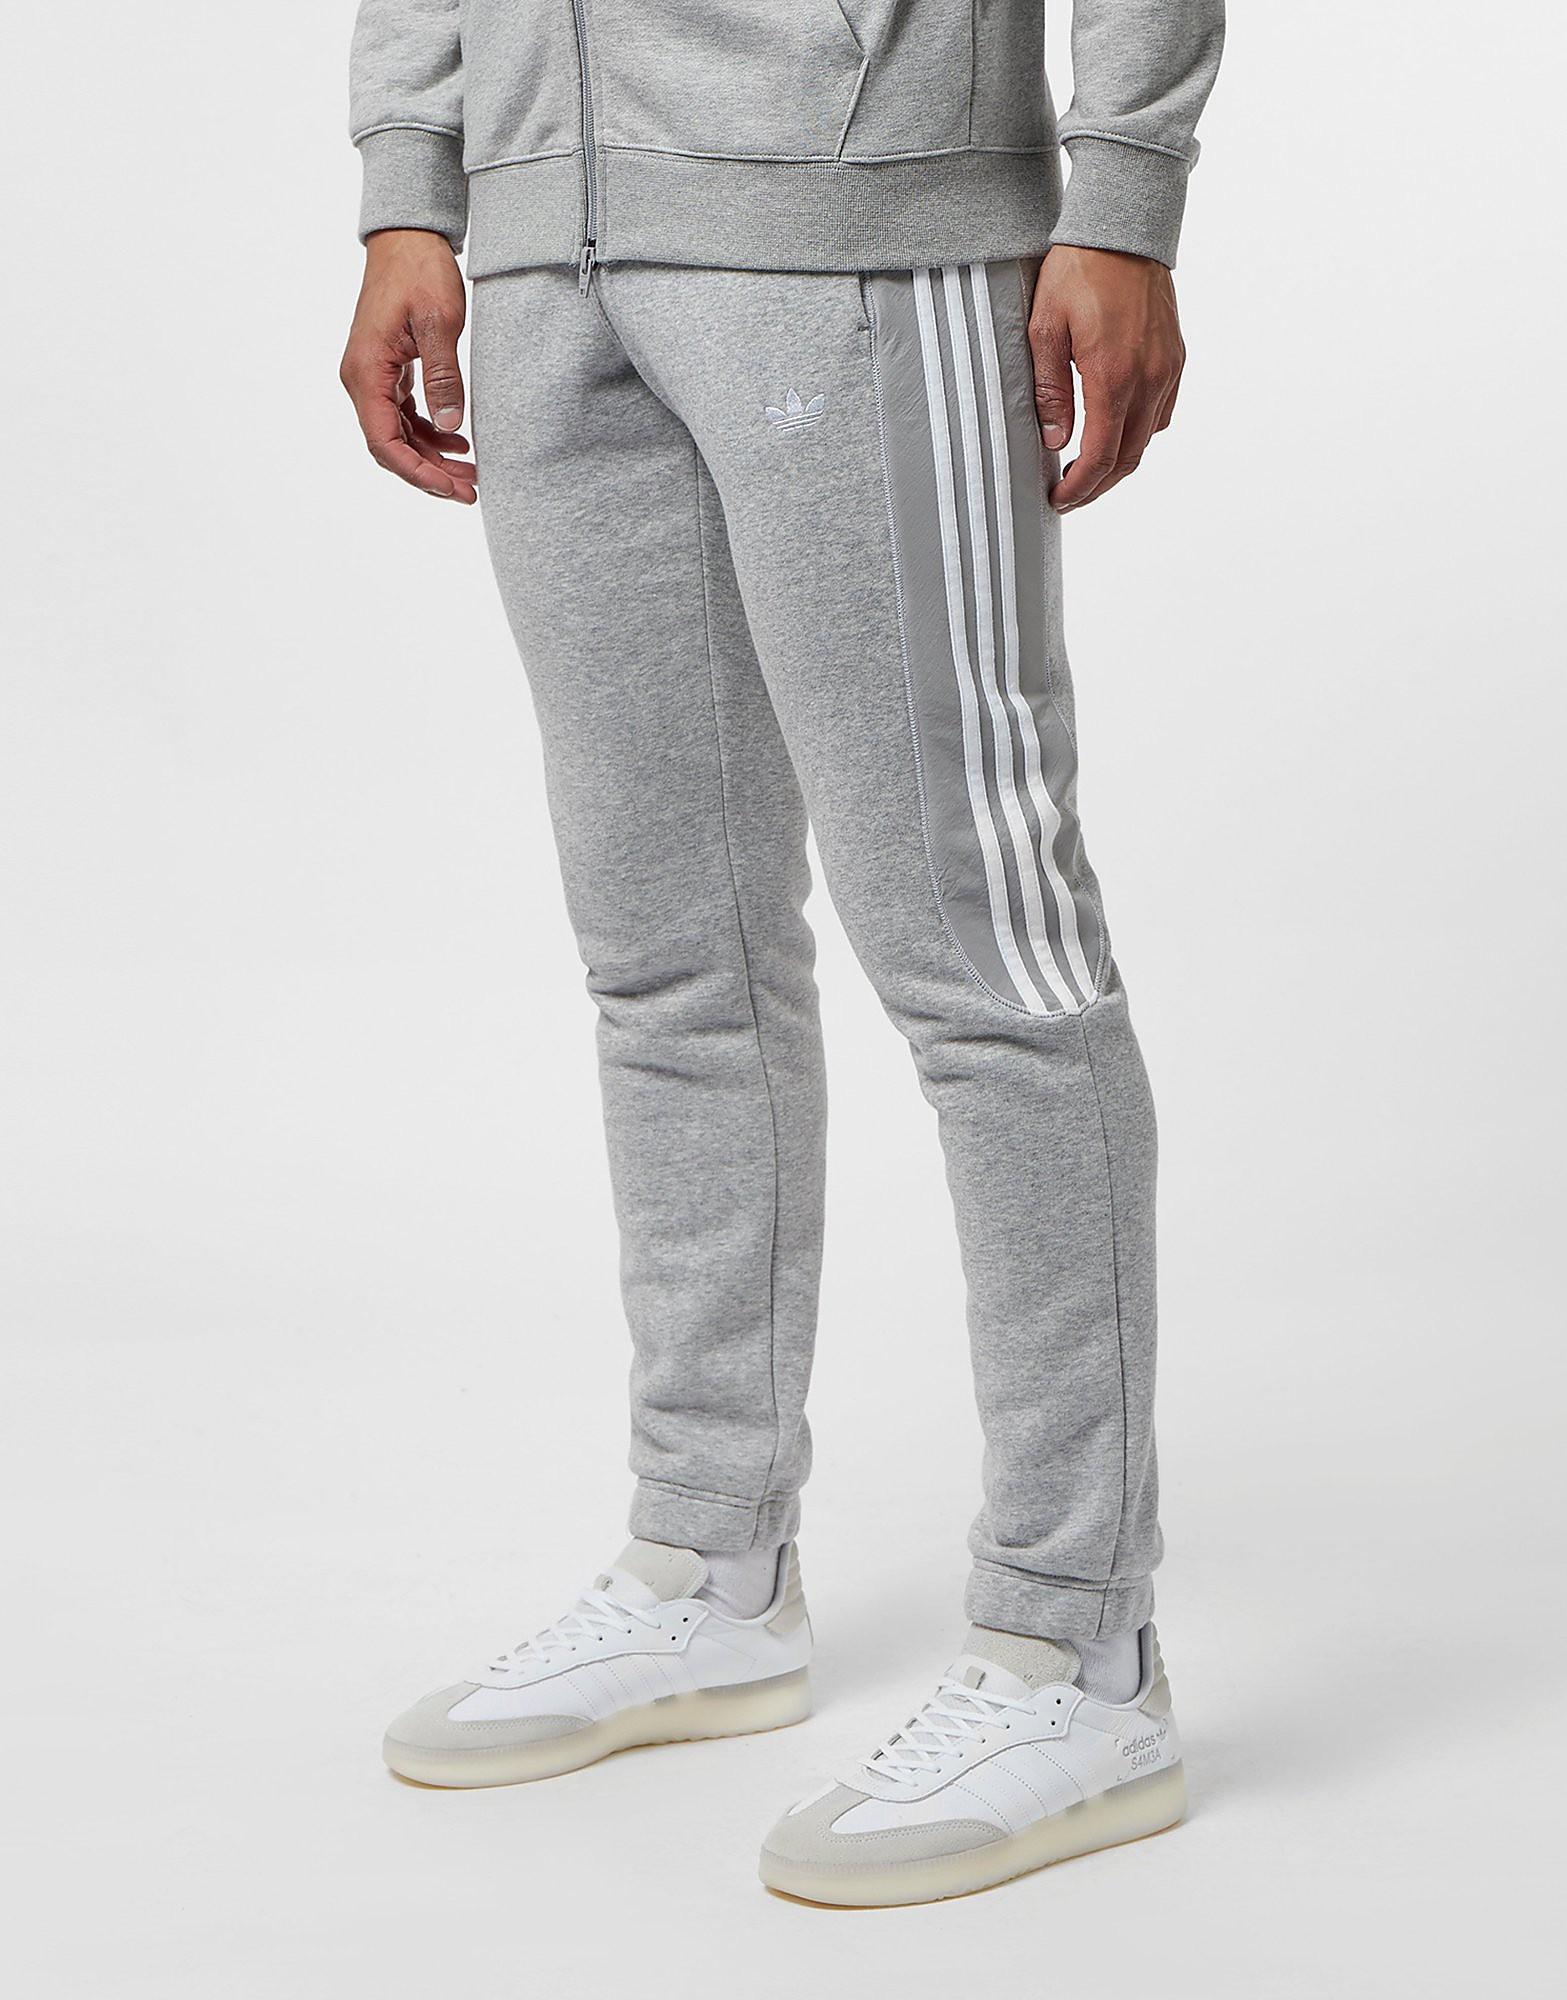 Adidas Originals Clothing Men S Tracksuits More Scotts Menswear